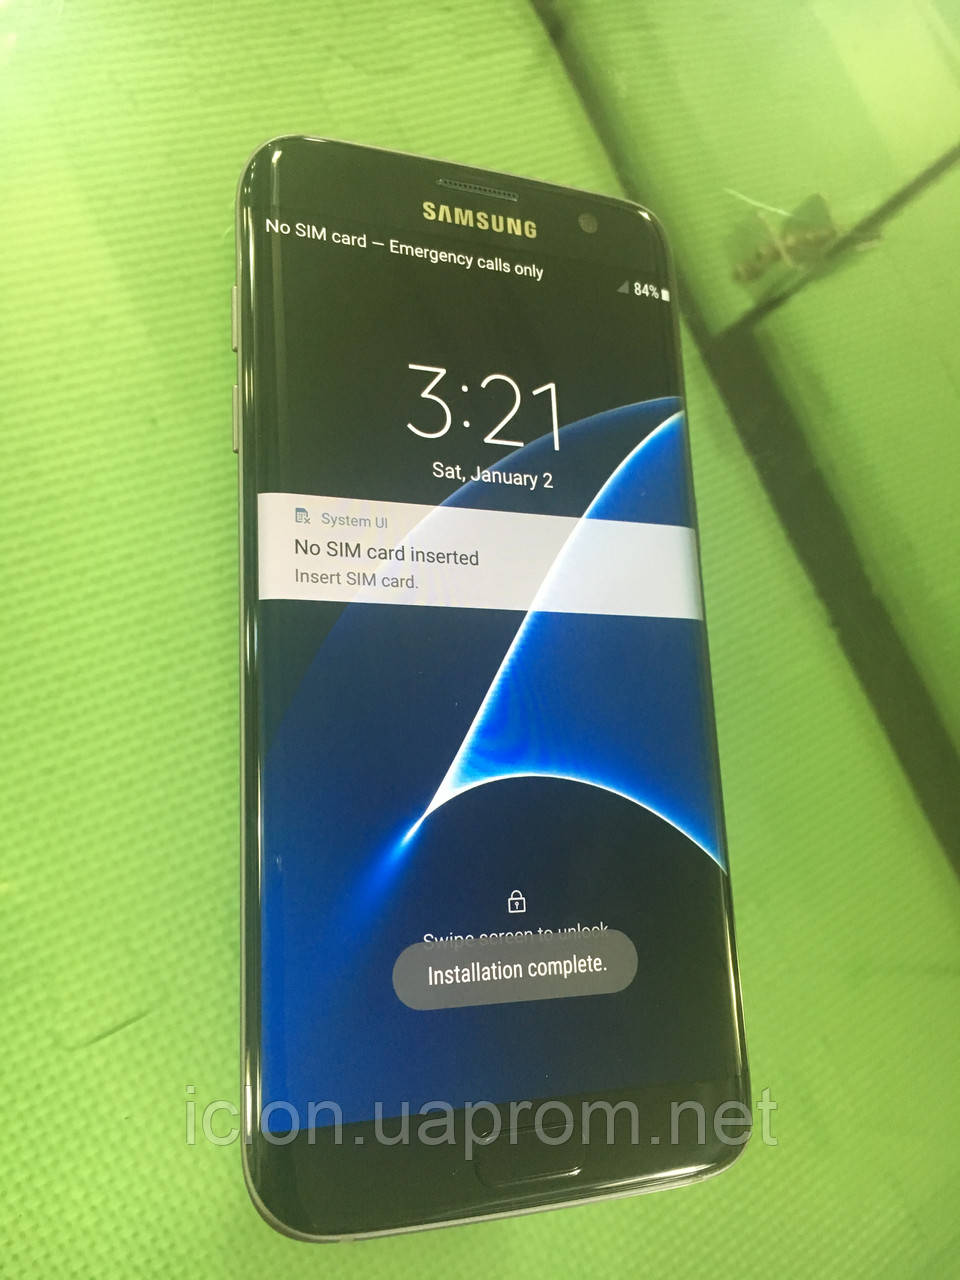 "Оригинал Samsung Galaxy S7/ S7 Edge 5.1""/5.5"" Snapdragon 820* 4Gb RAM+32/64Gb замена Xiaomi mi5, xiaomi mi6"